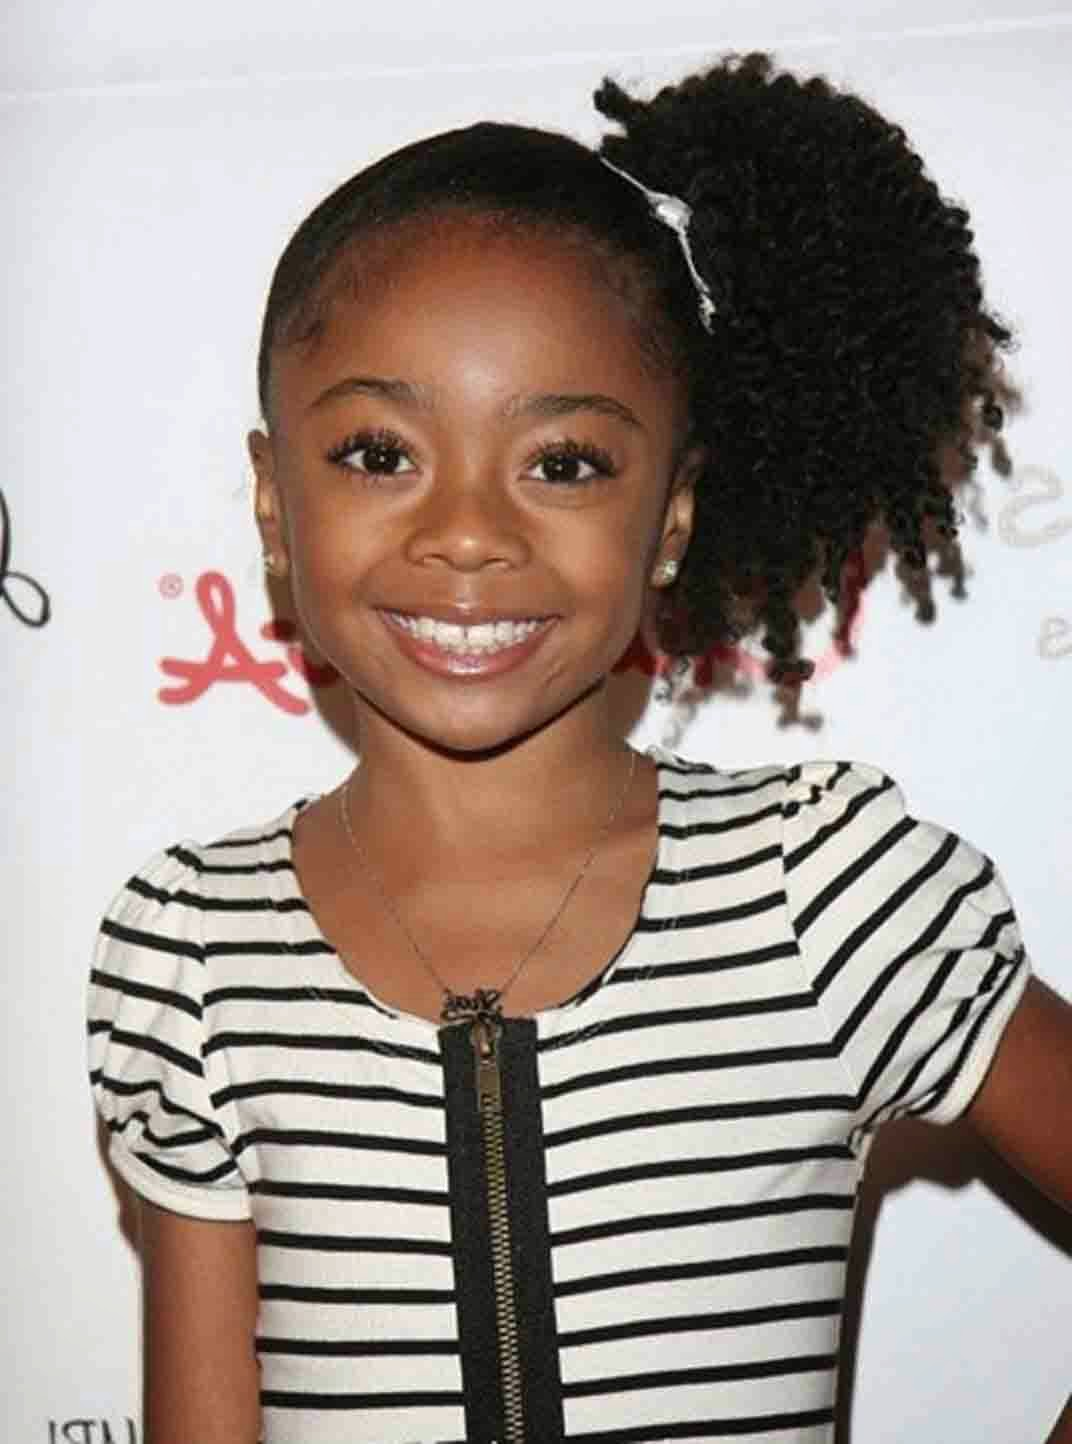 Sensational Wow Surprising Braided Hairstyles For Little Black Girls Hairstyles For Women Draintrainus